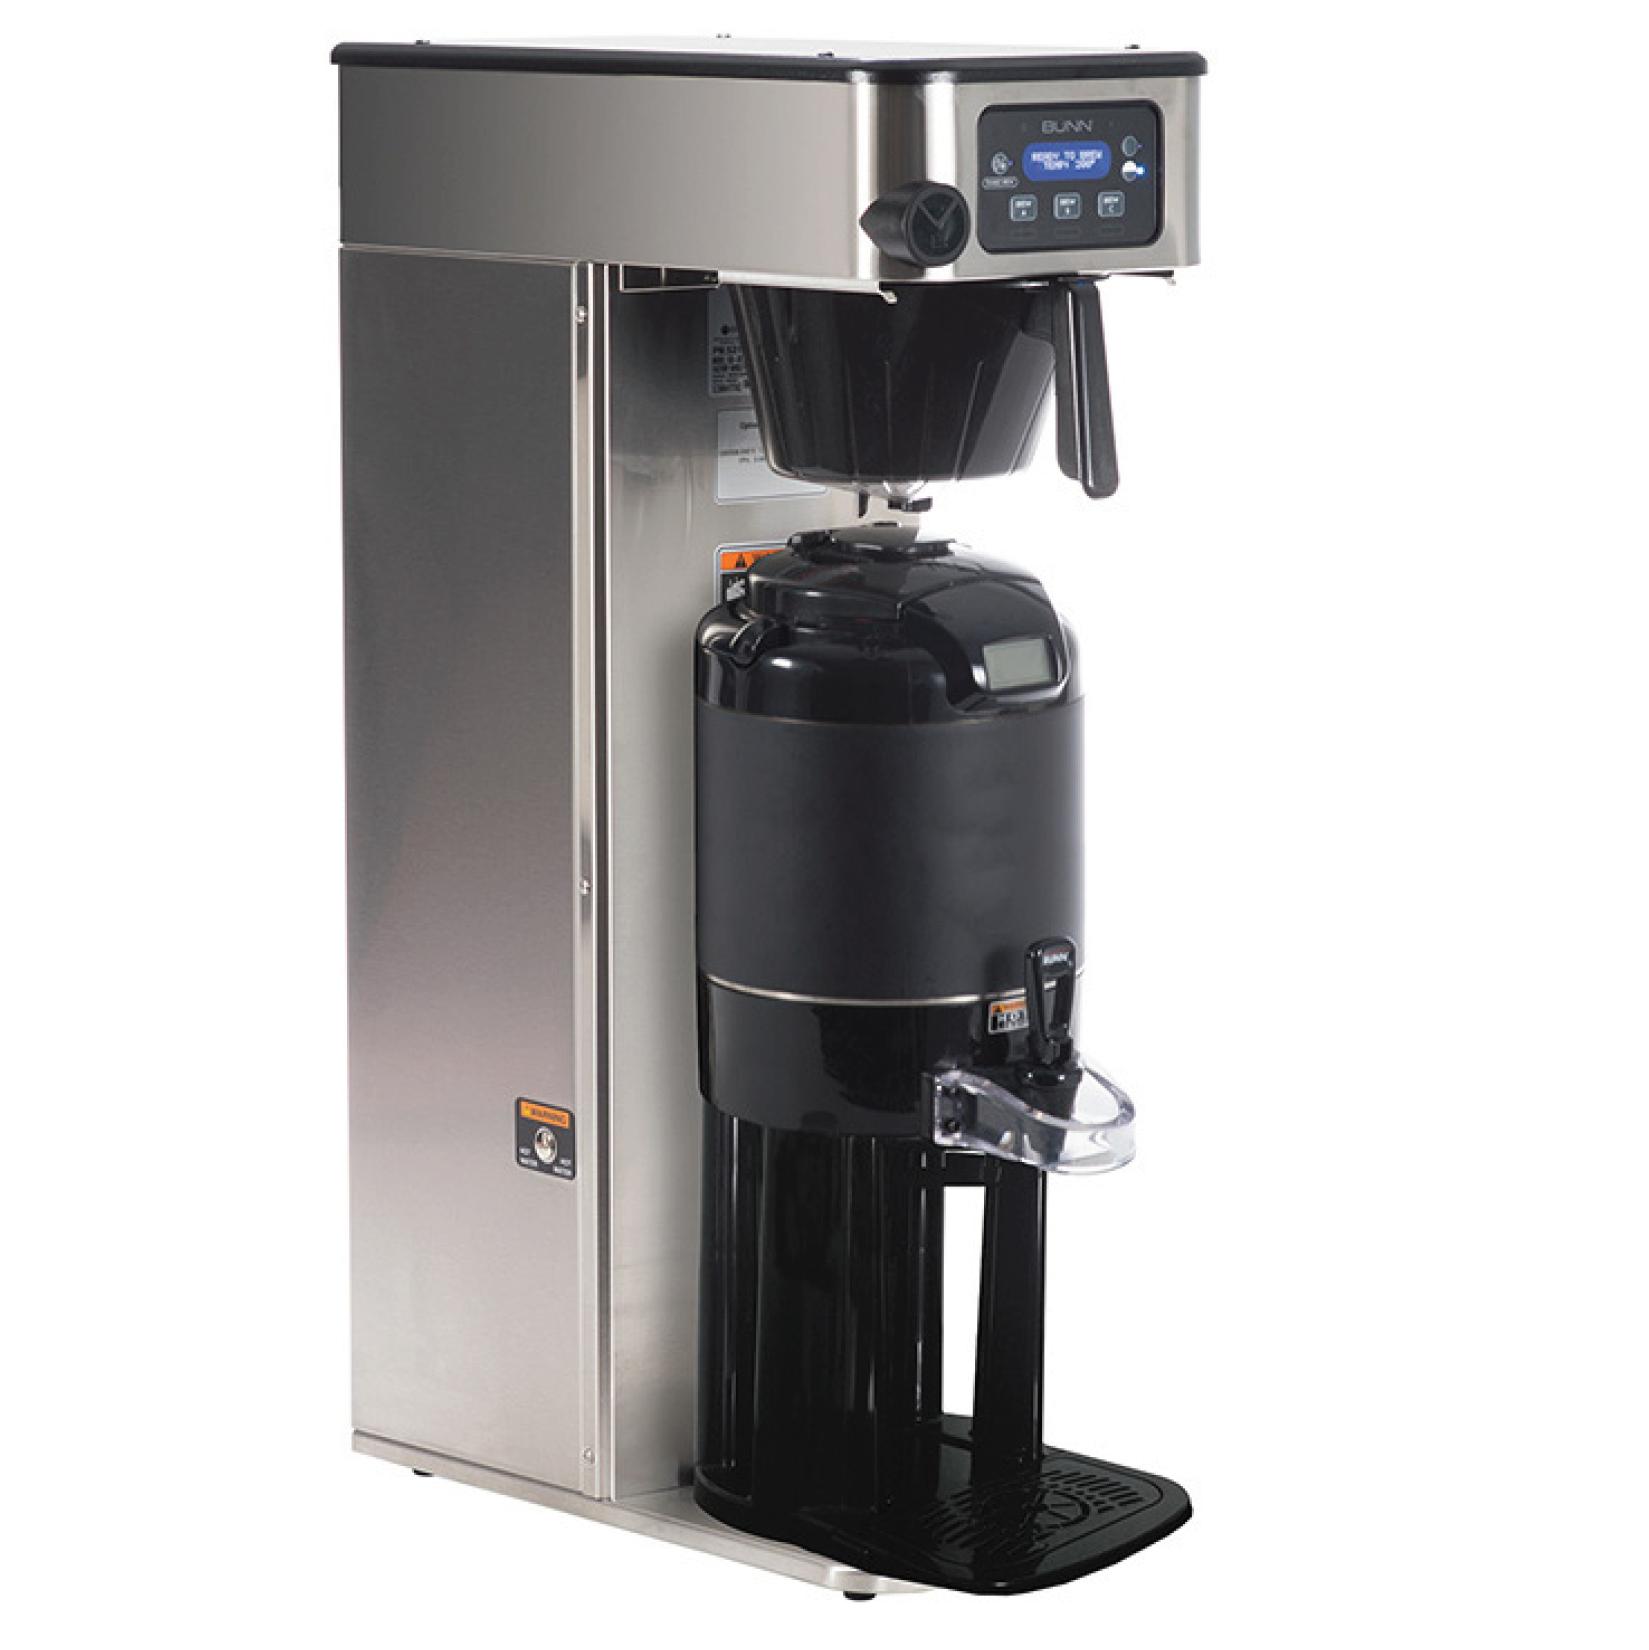 Bunn Infusion Series ICB Tall Coffee Brewer - 53100.6101